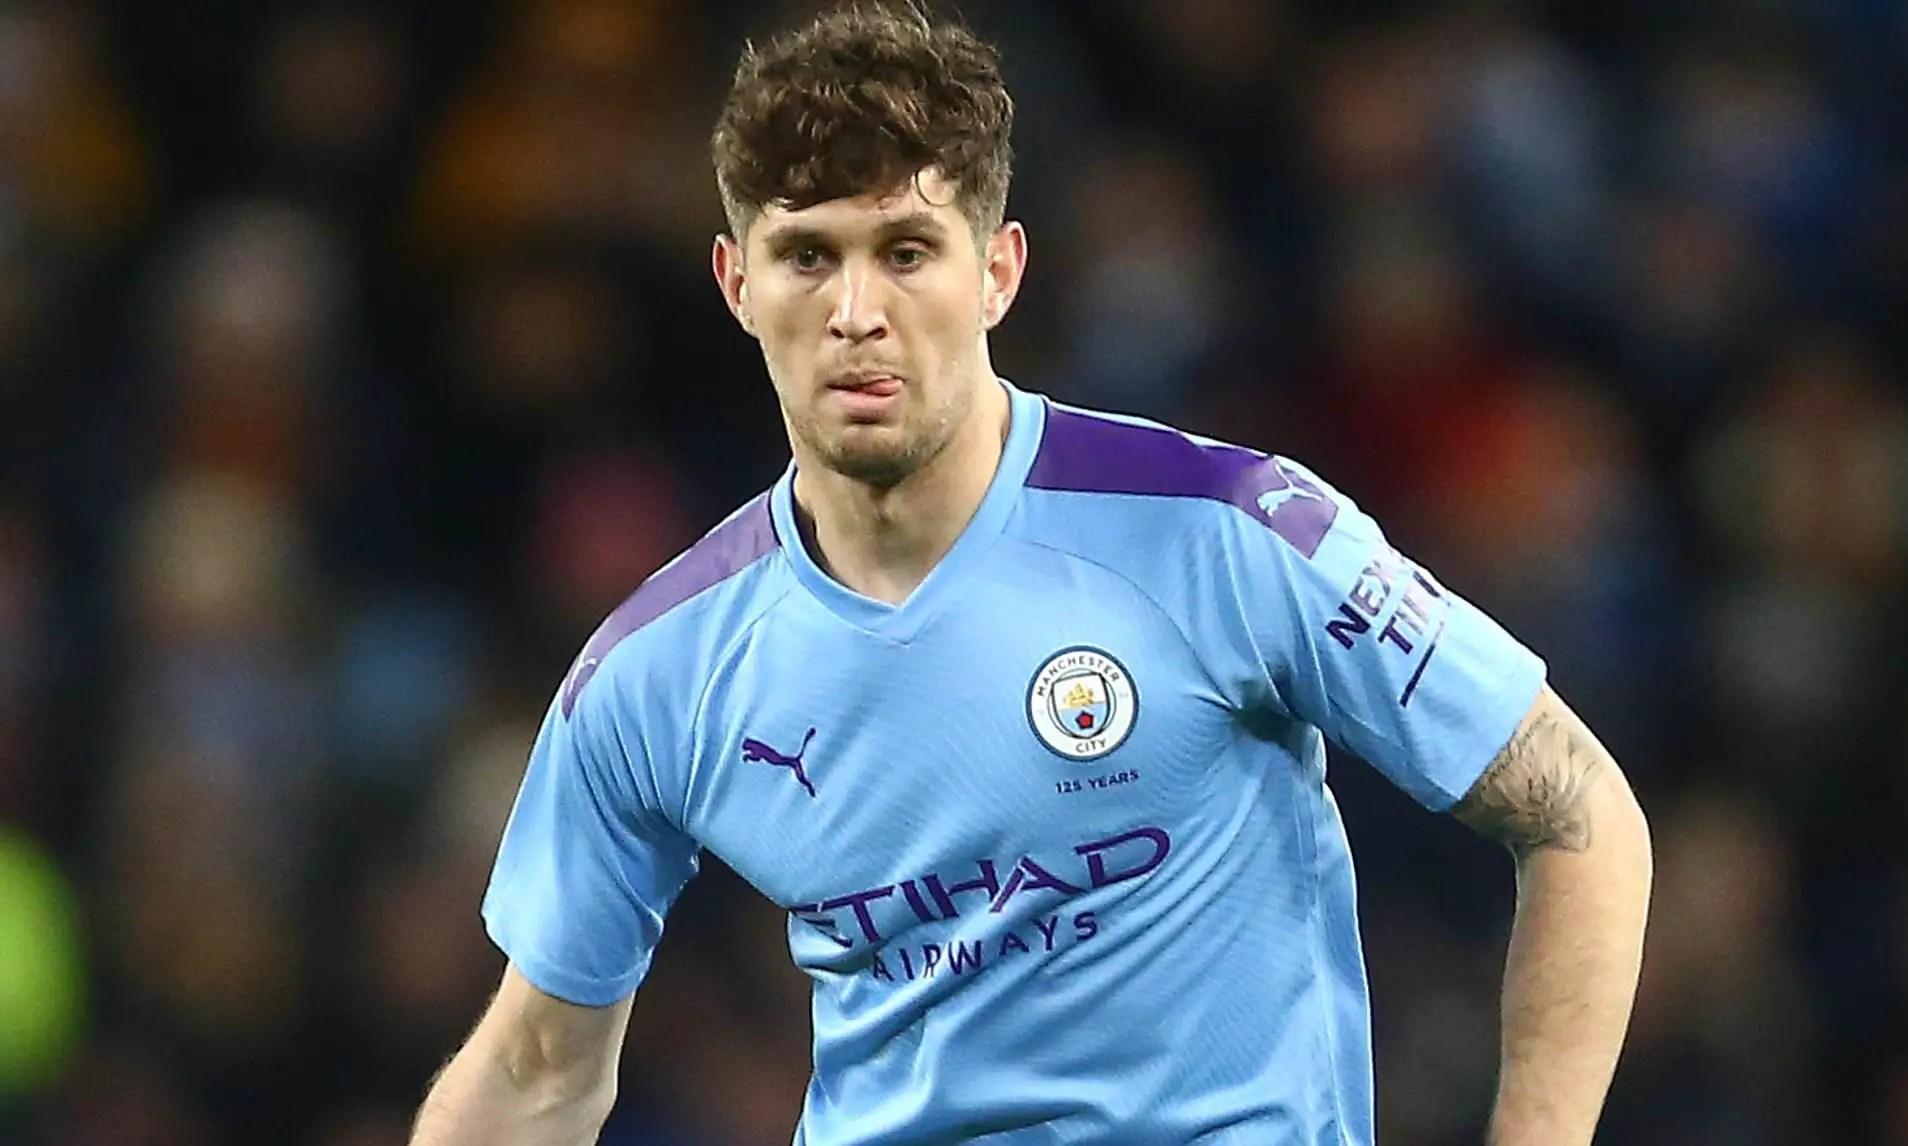 Arteta Considering Loan Move For Man City Defender Stones